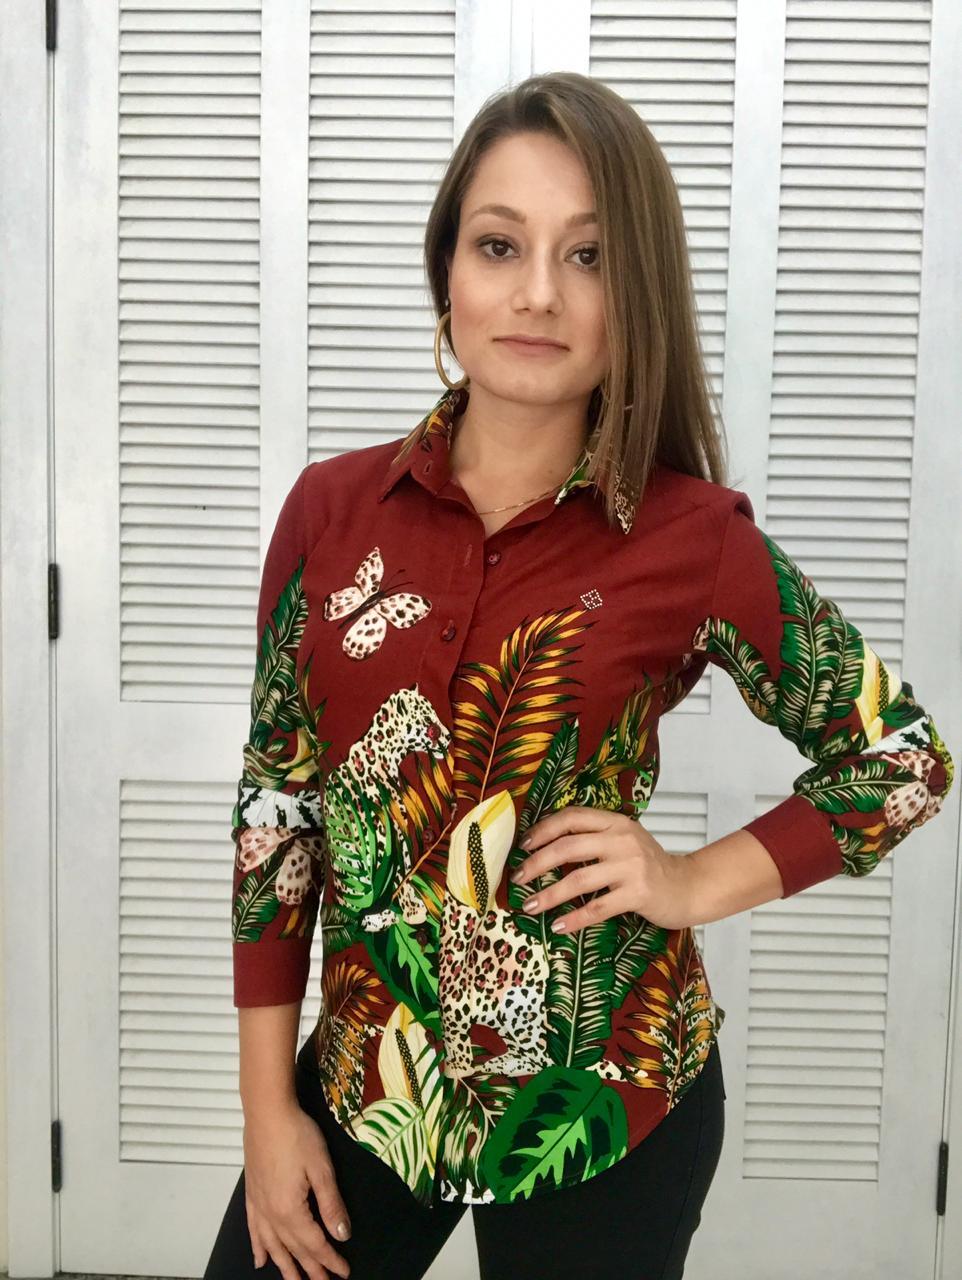 40320fc4bc CAMISA SOCIAL FEMININA ESTAMPADA ONÇA MARROM camisa social feminina